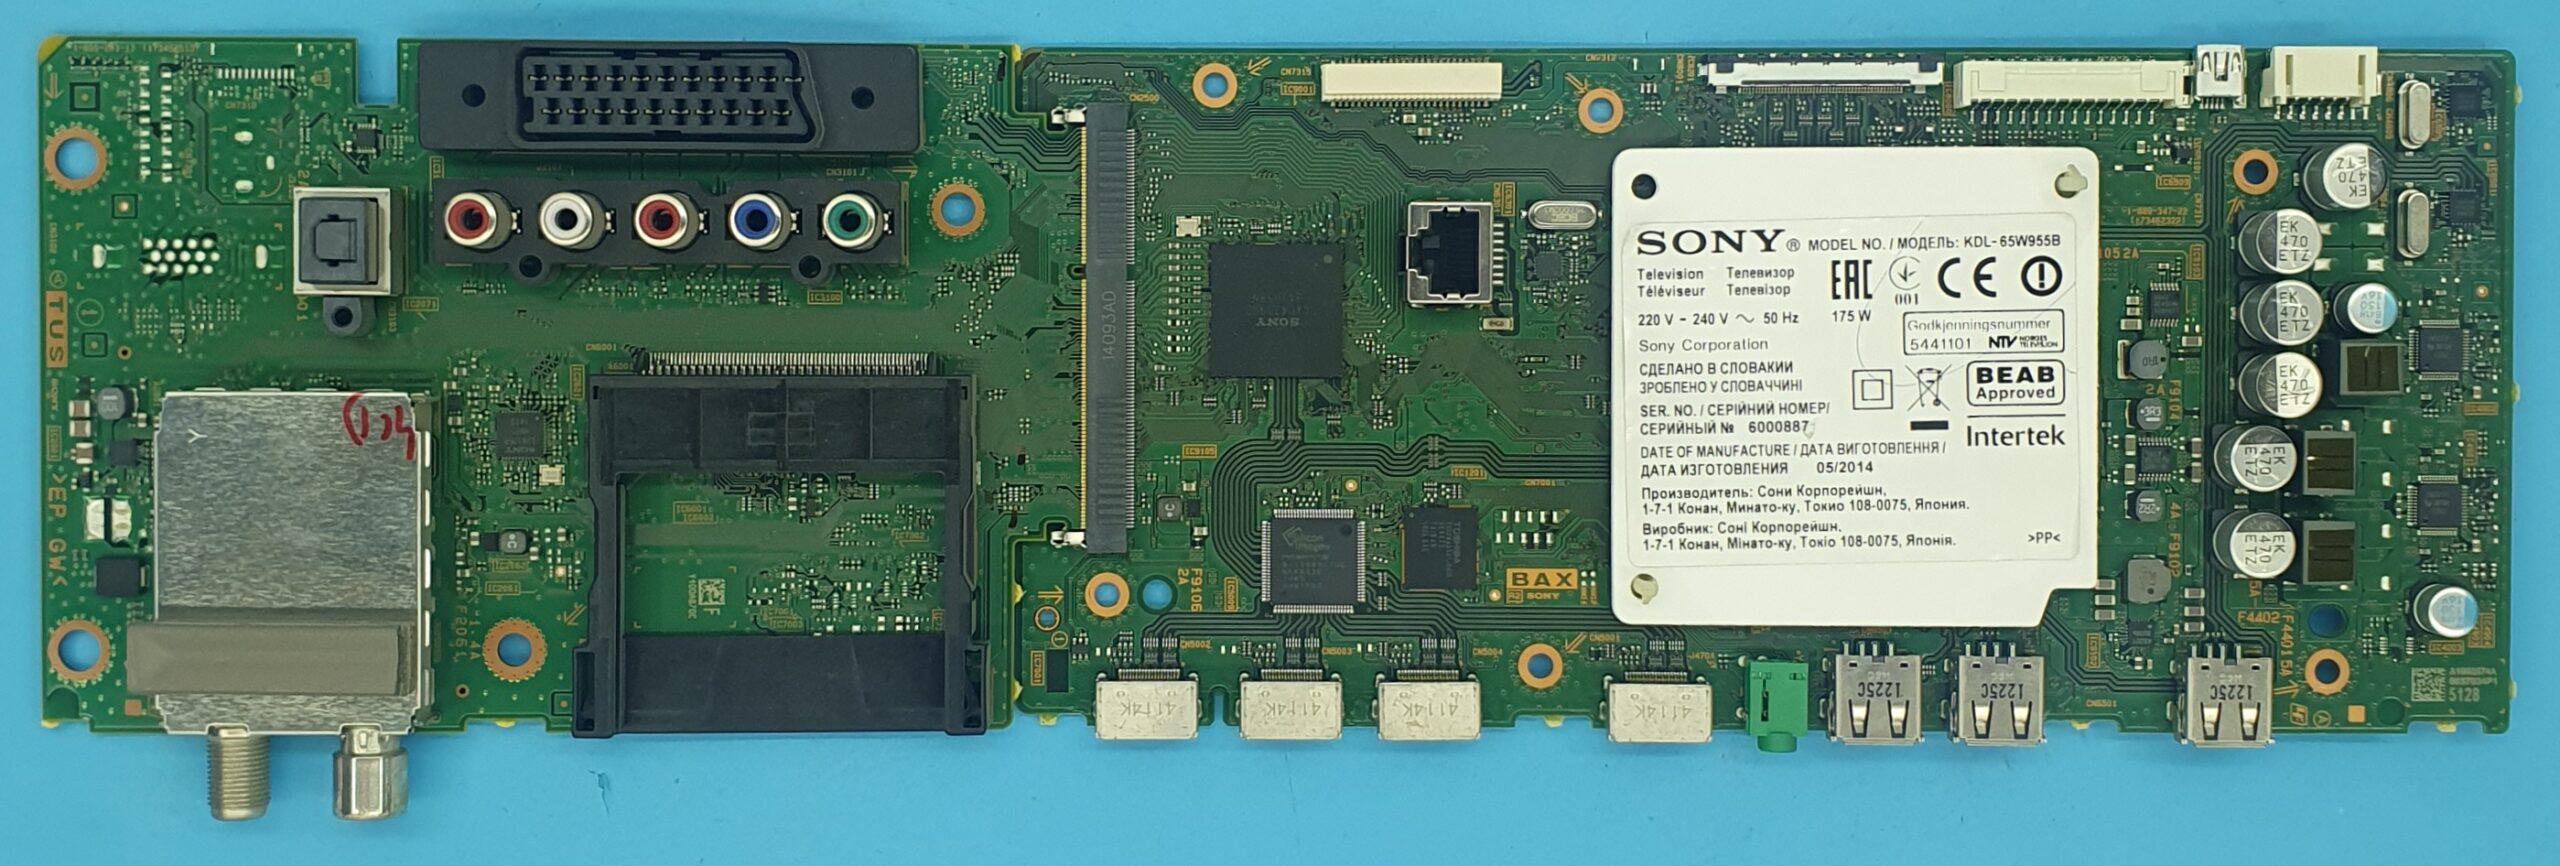 1-889-347-22 Sony Anakart (KDV DAHİL = 500 TL)